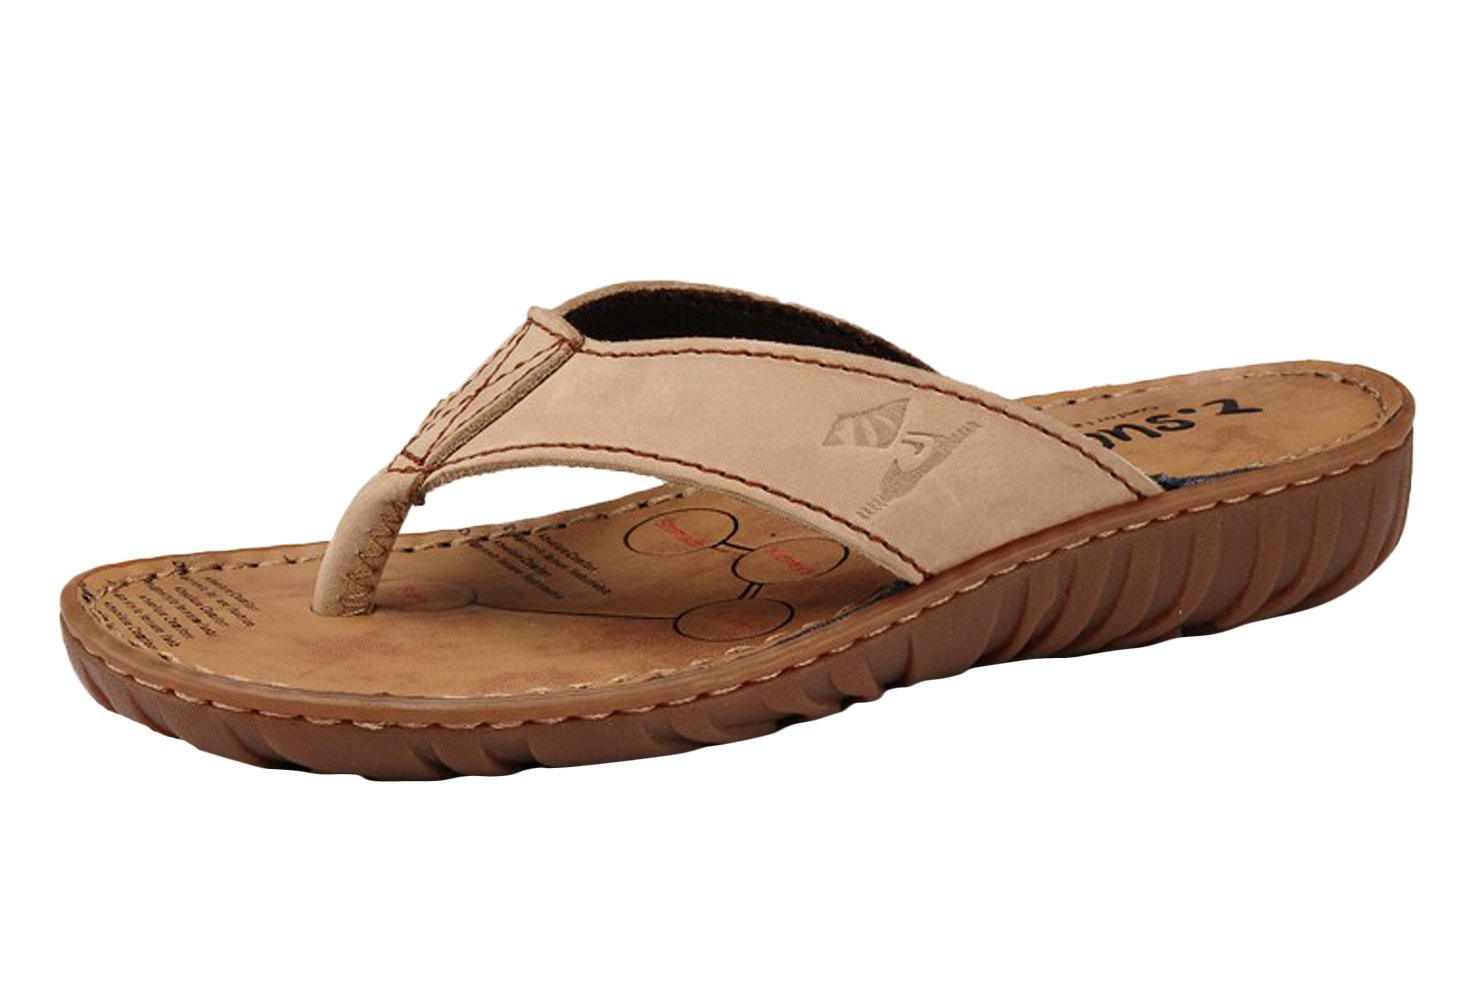 Insun Damen Sandalen Zehentrenner Normal Flach Ohne Verschluss Pantoletten Sandaletten